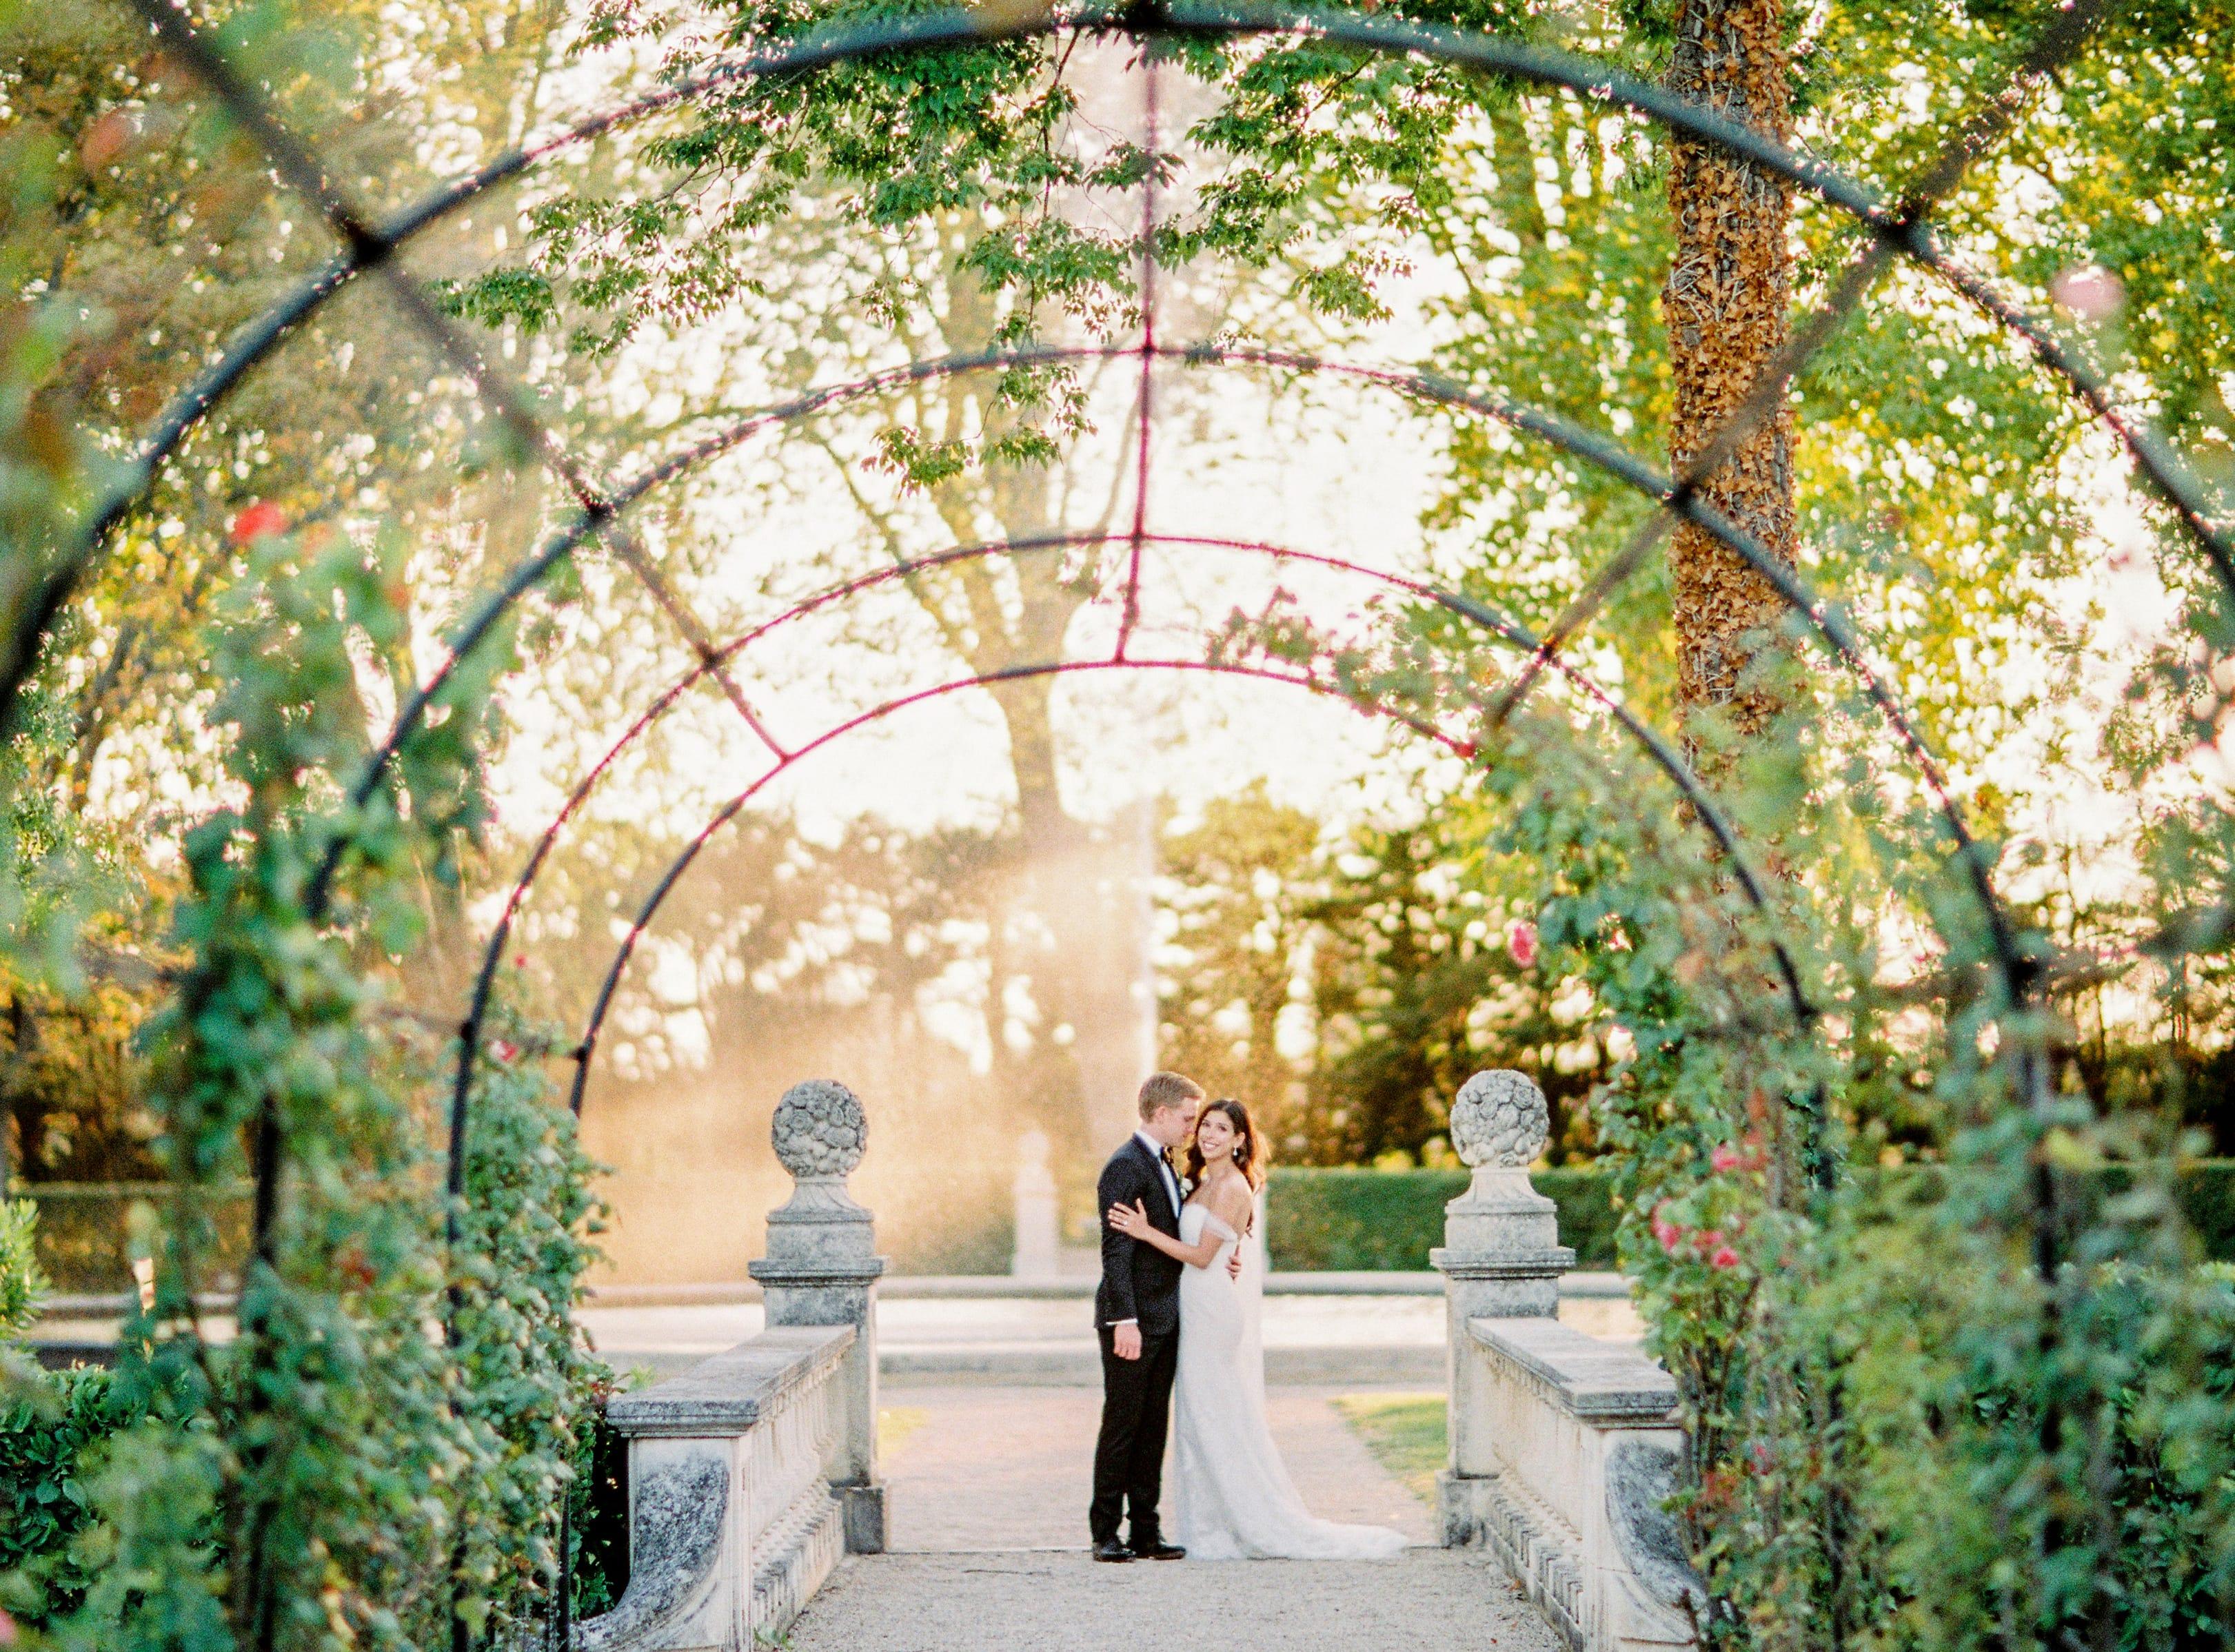 A wedding in Provence, France - Film Photography - Brancoprata